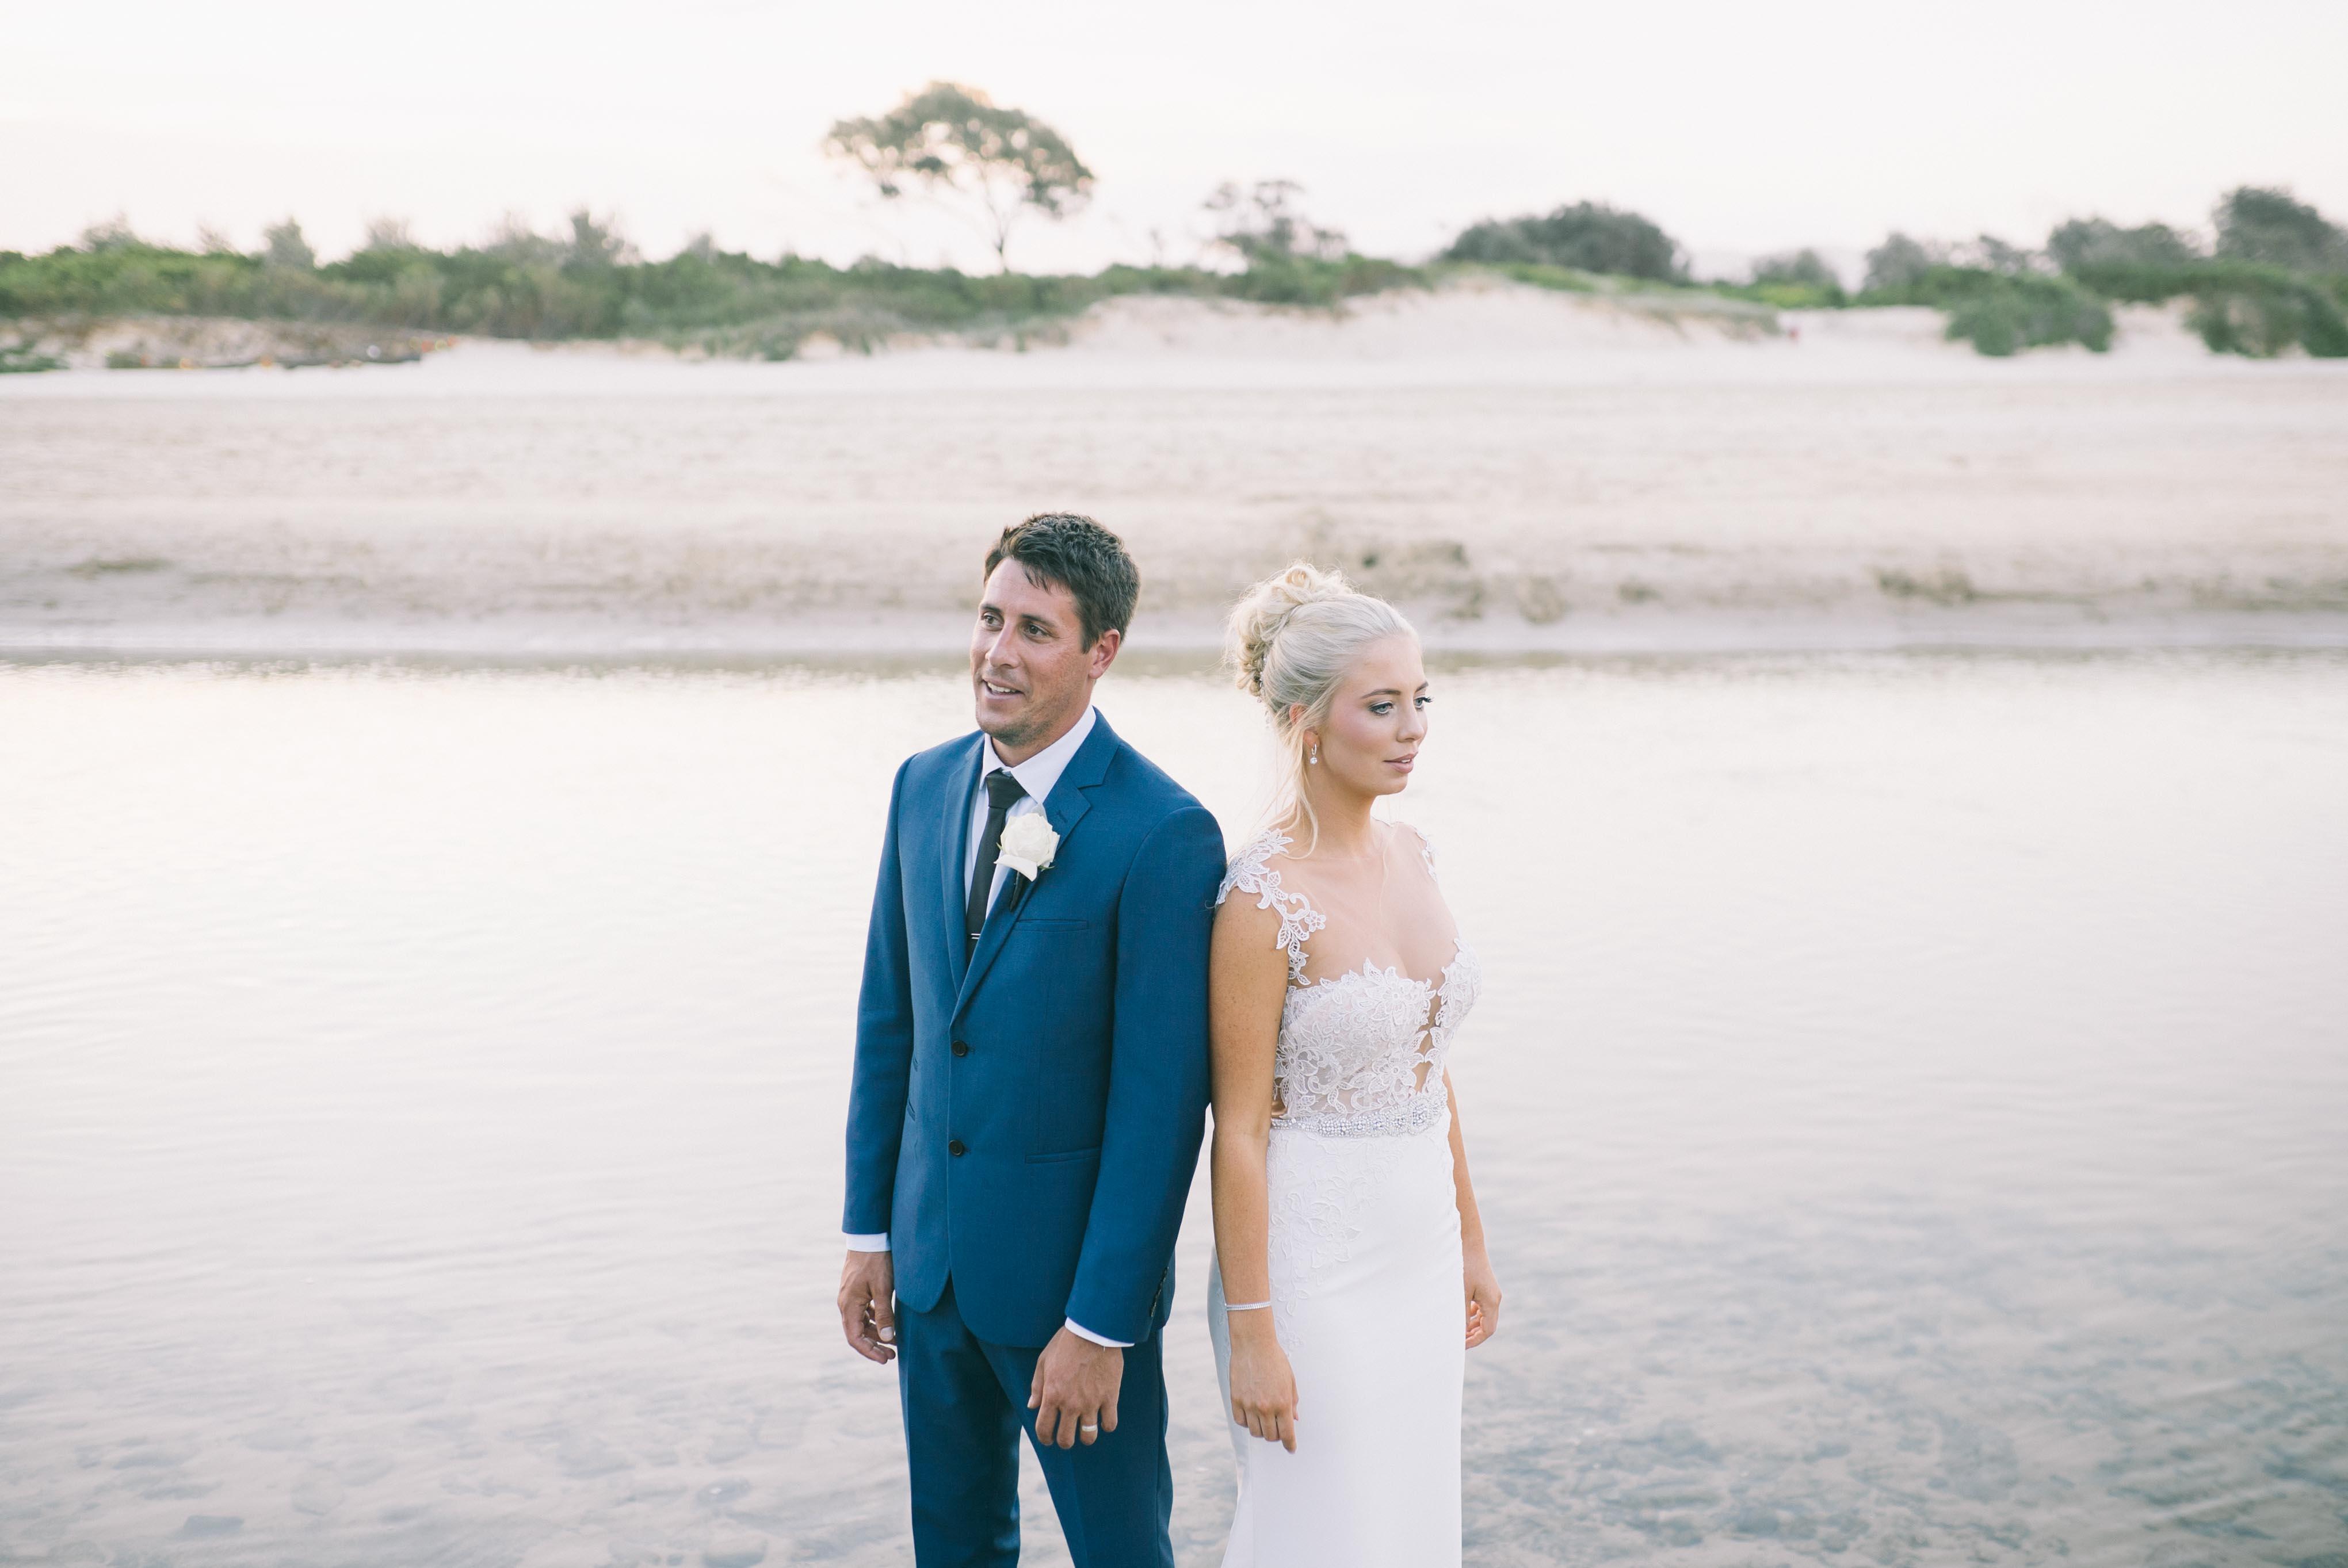 Mitch + Laura | 19/11/2016 | Crescent Head, NSW